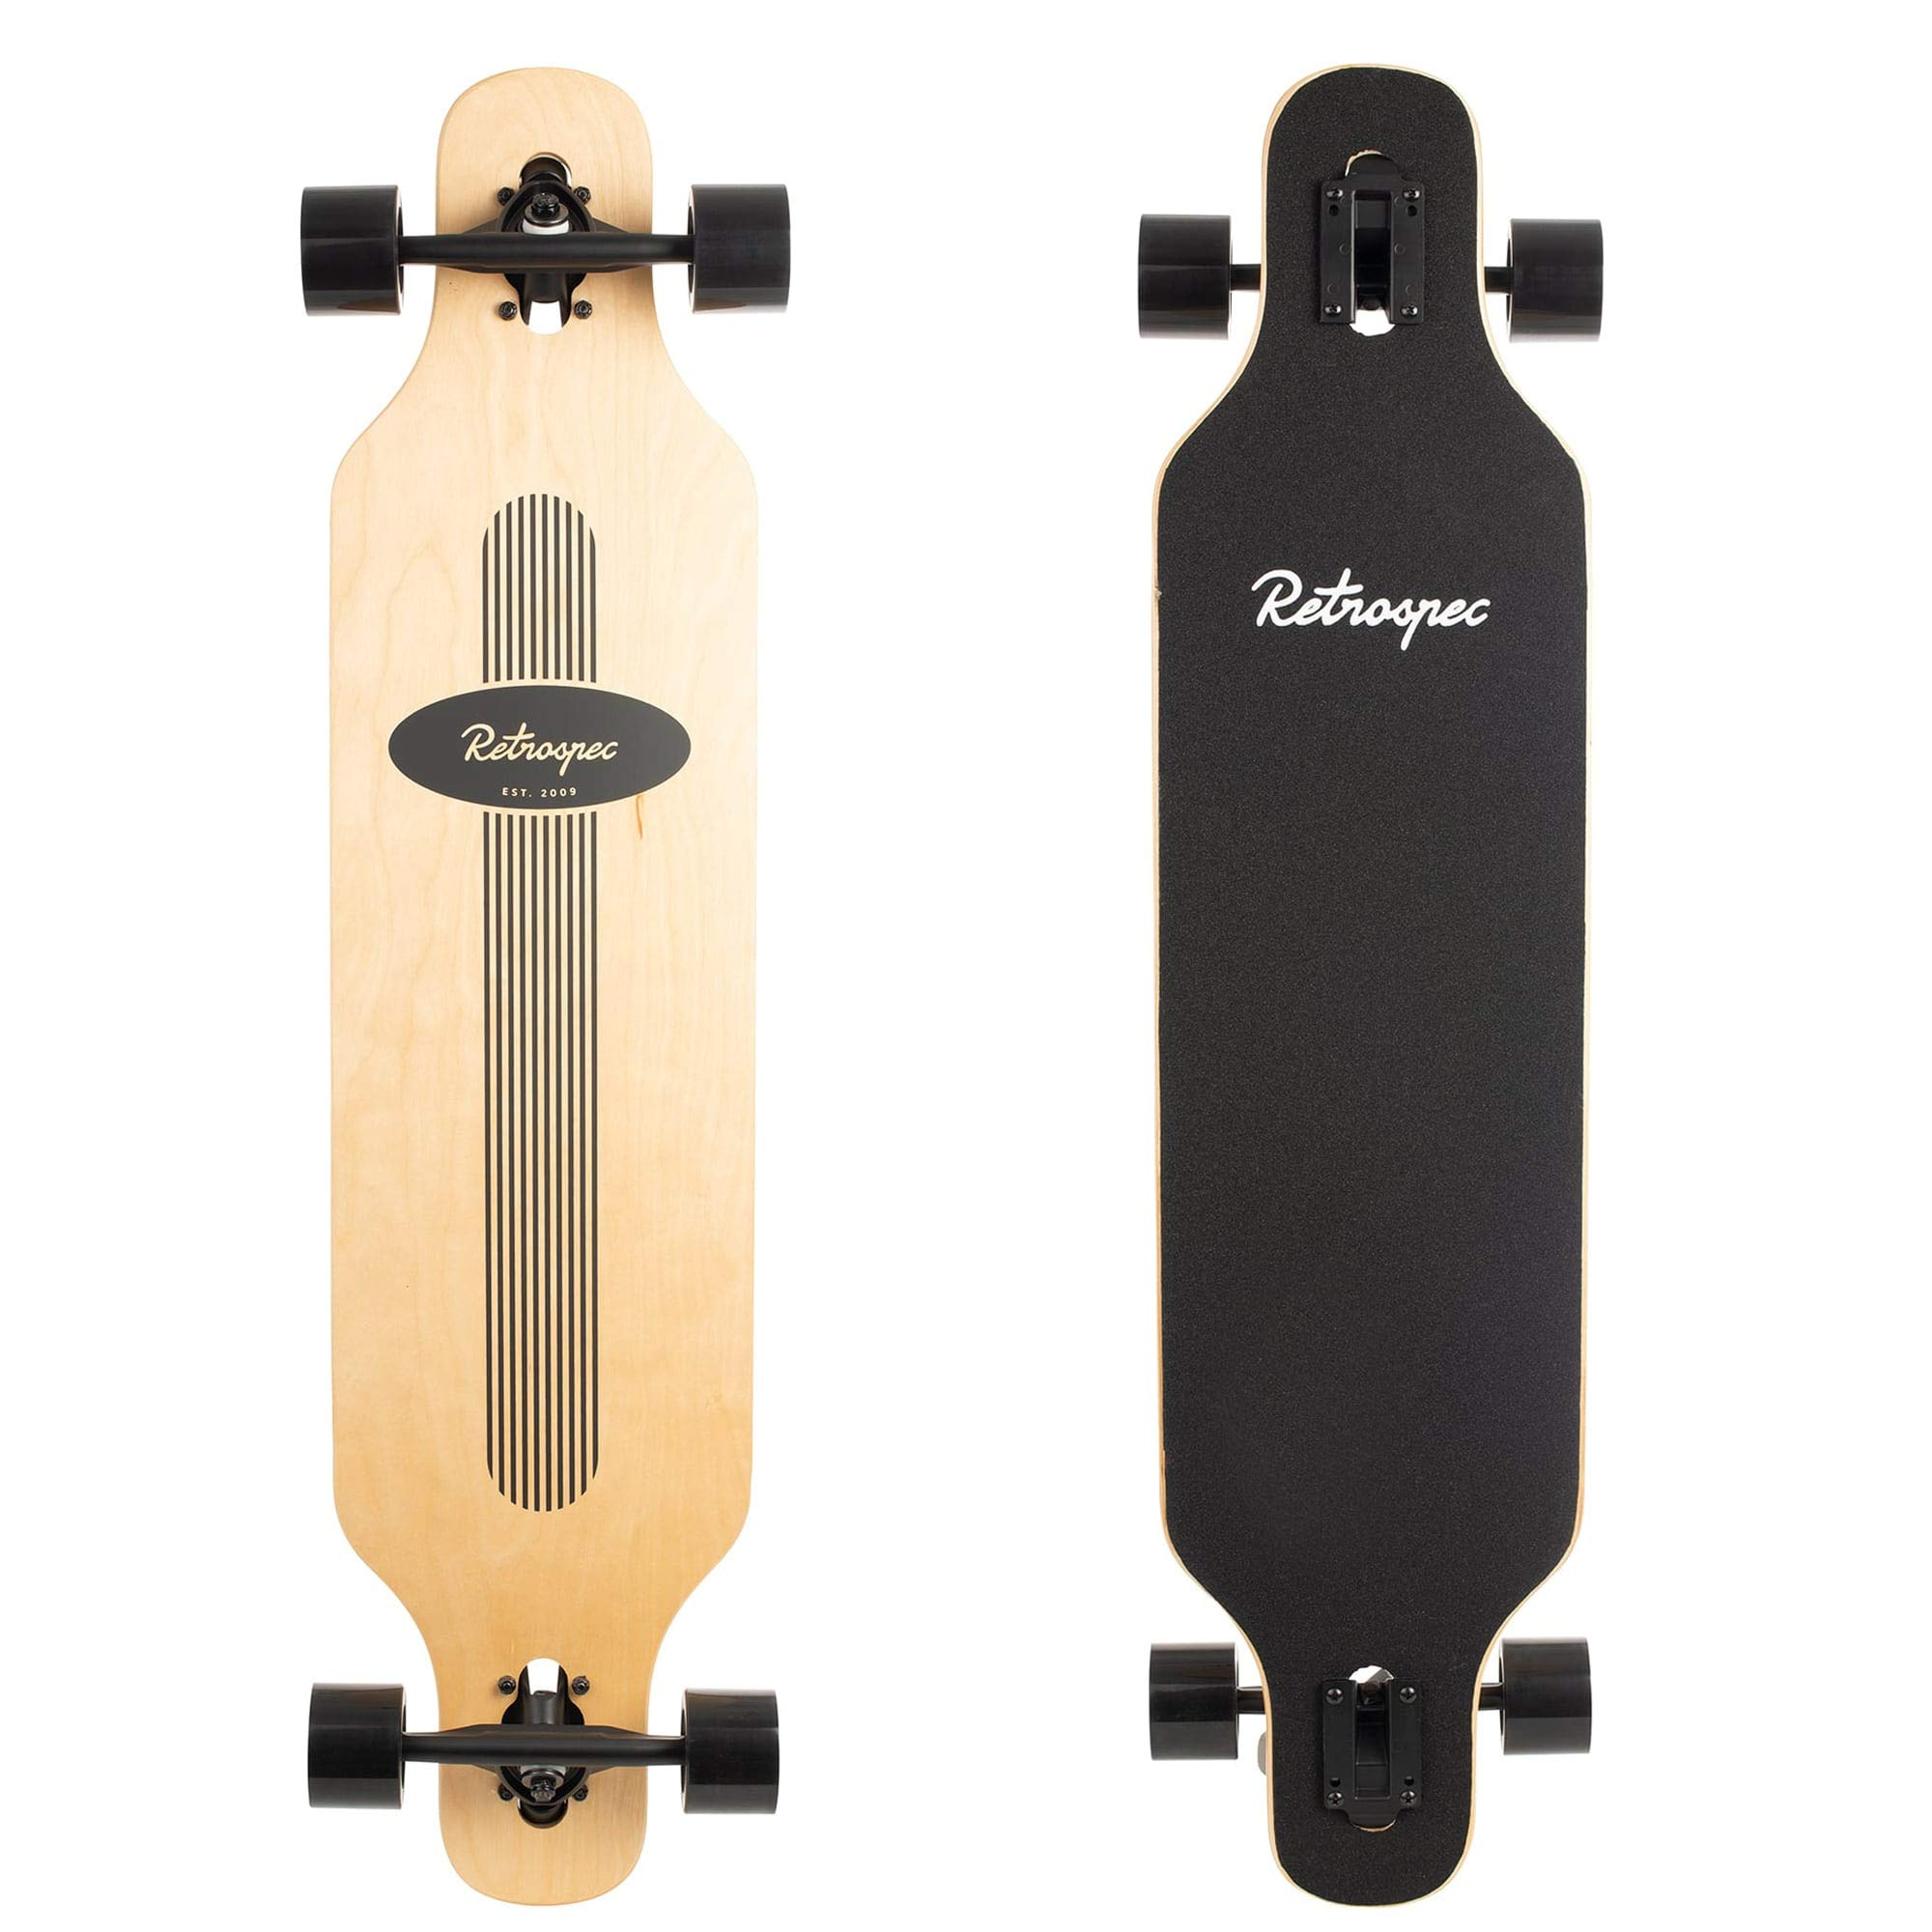 Retrospec Rift Drop-Through Longboard Skateboard Complete